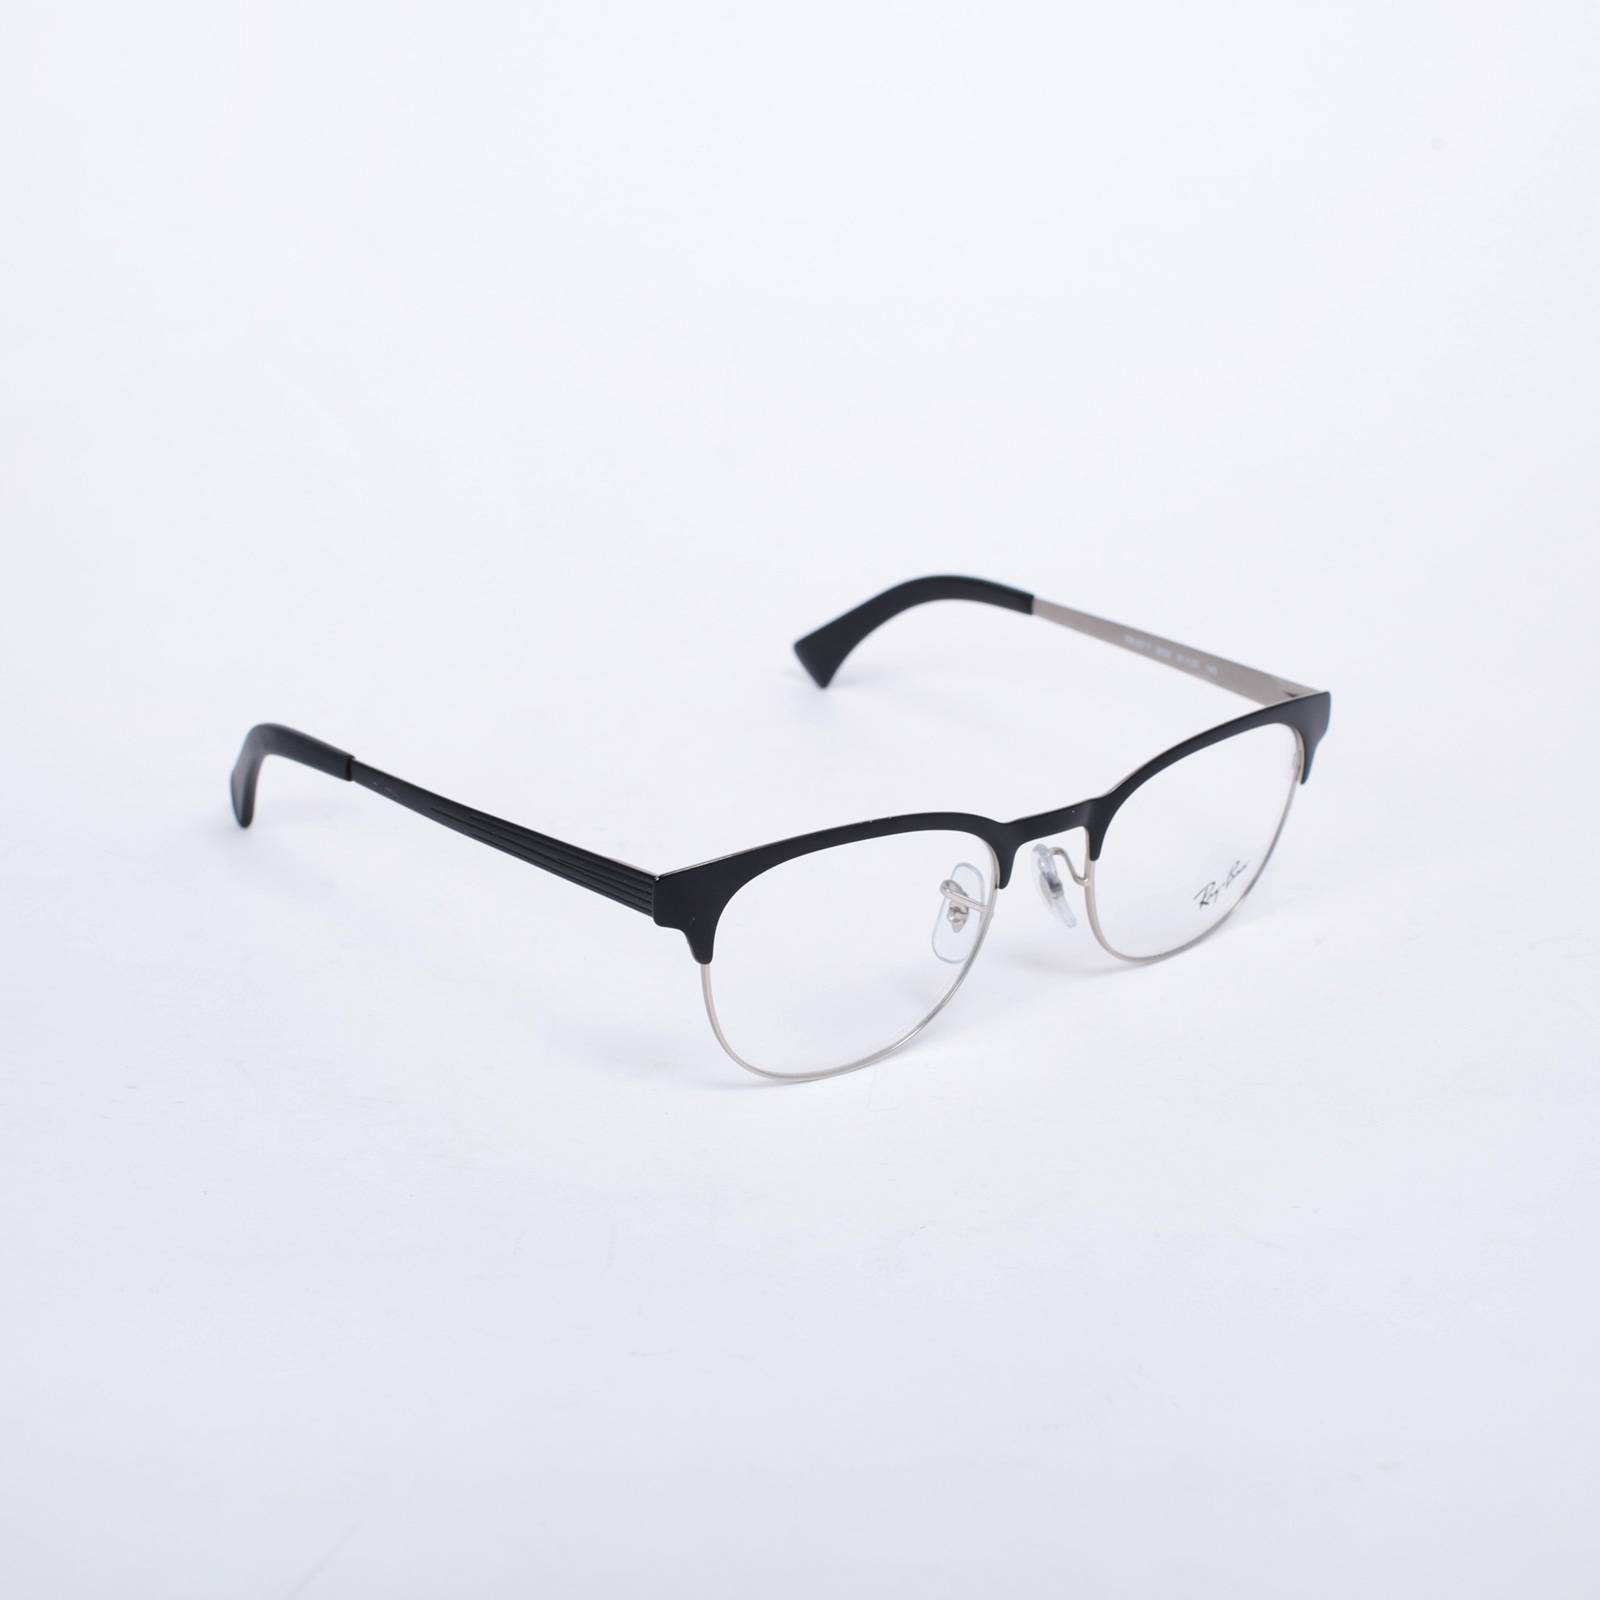 a46918b9fa3f Купить очки Ray Ban в Москве с доставкой по цене 3000 рублей ...